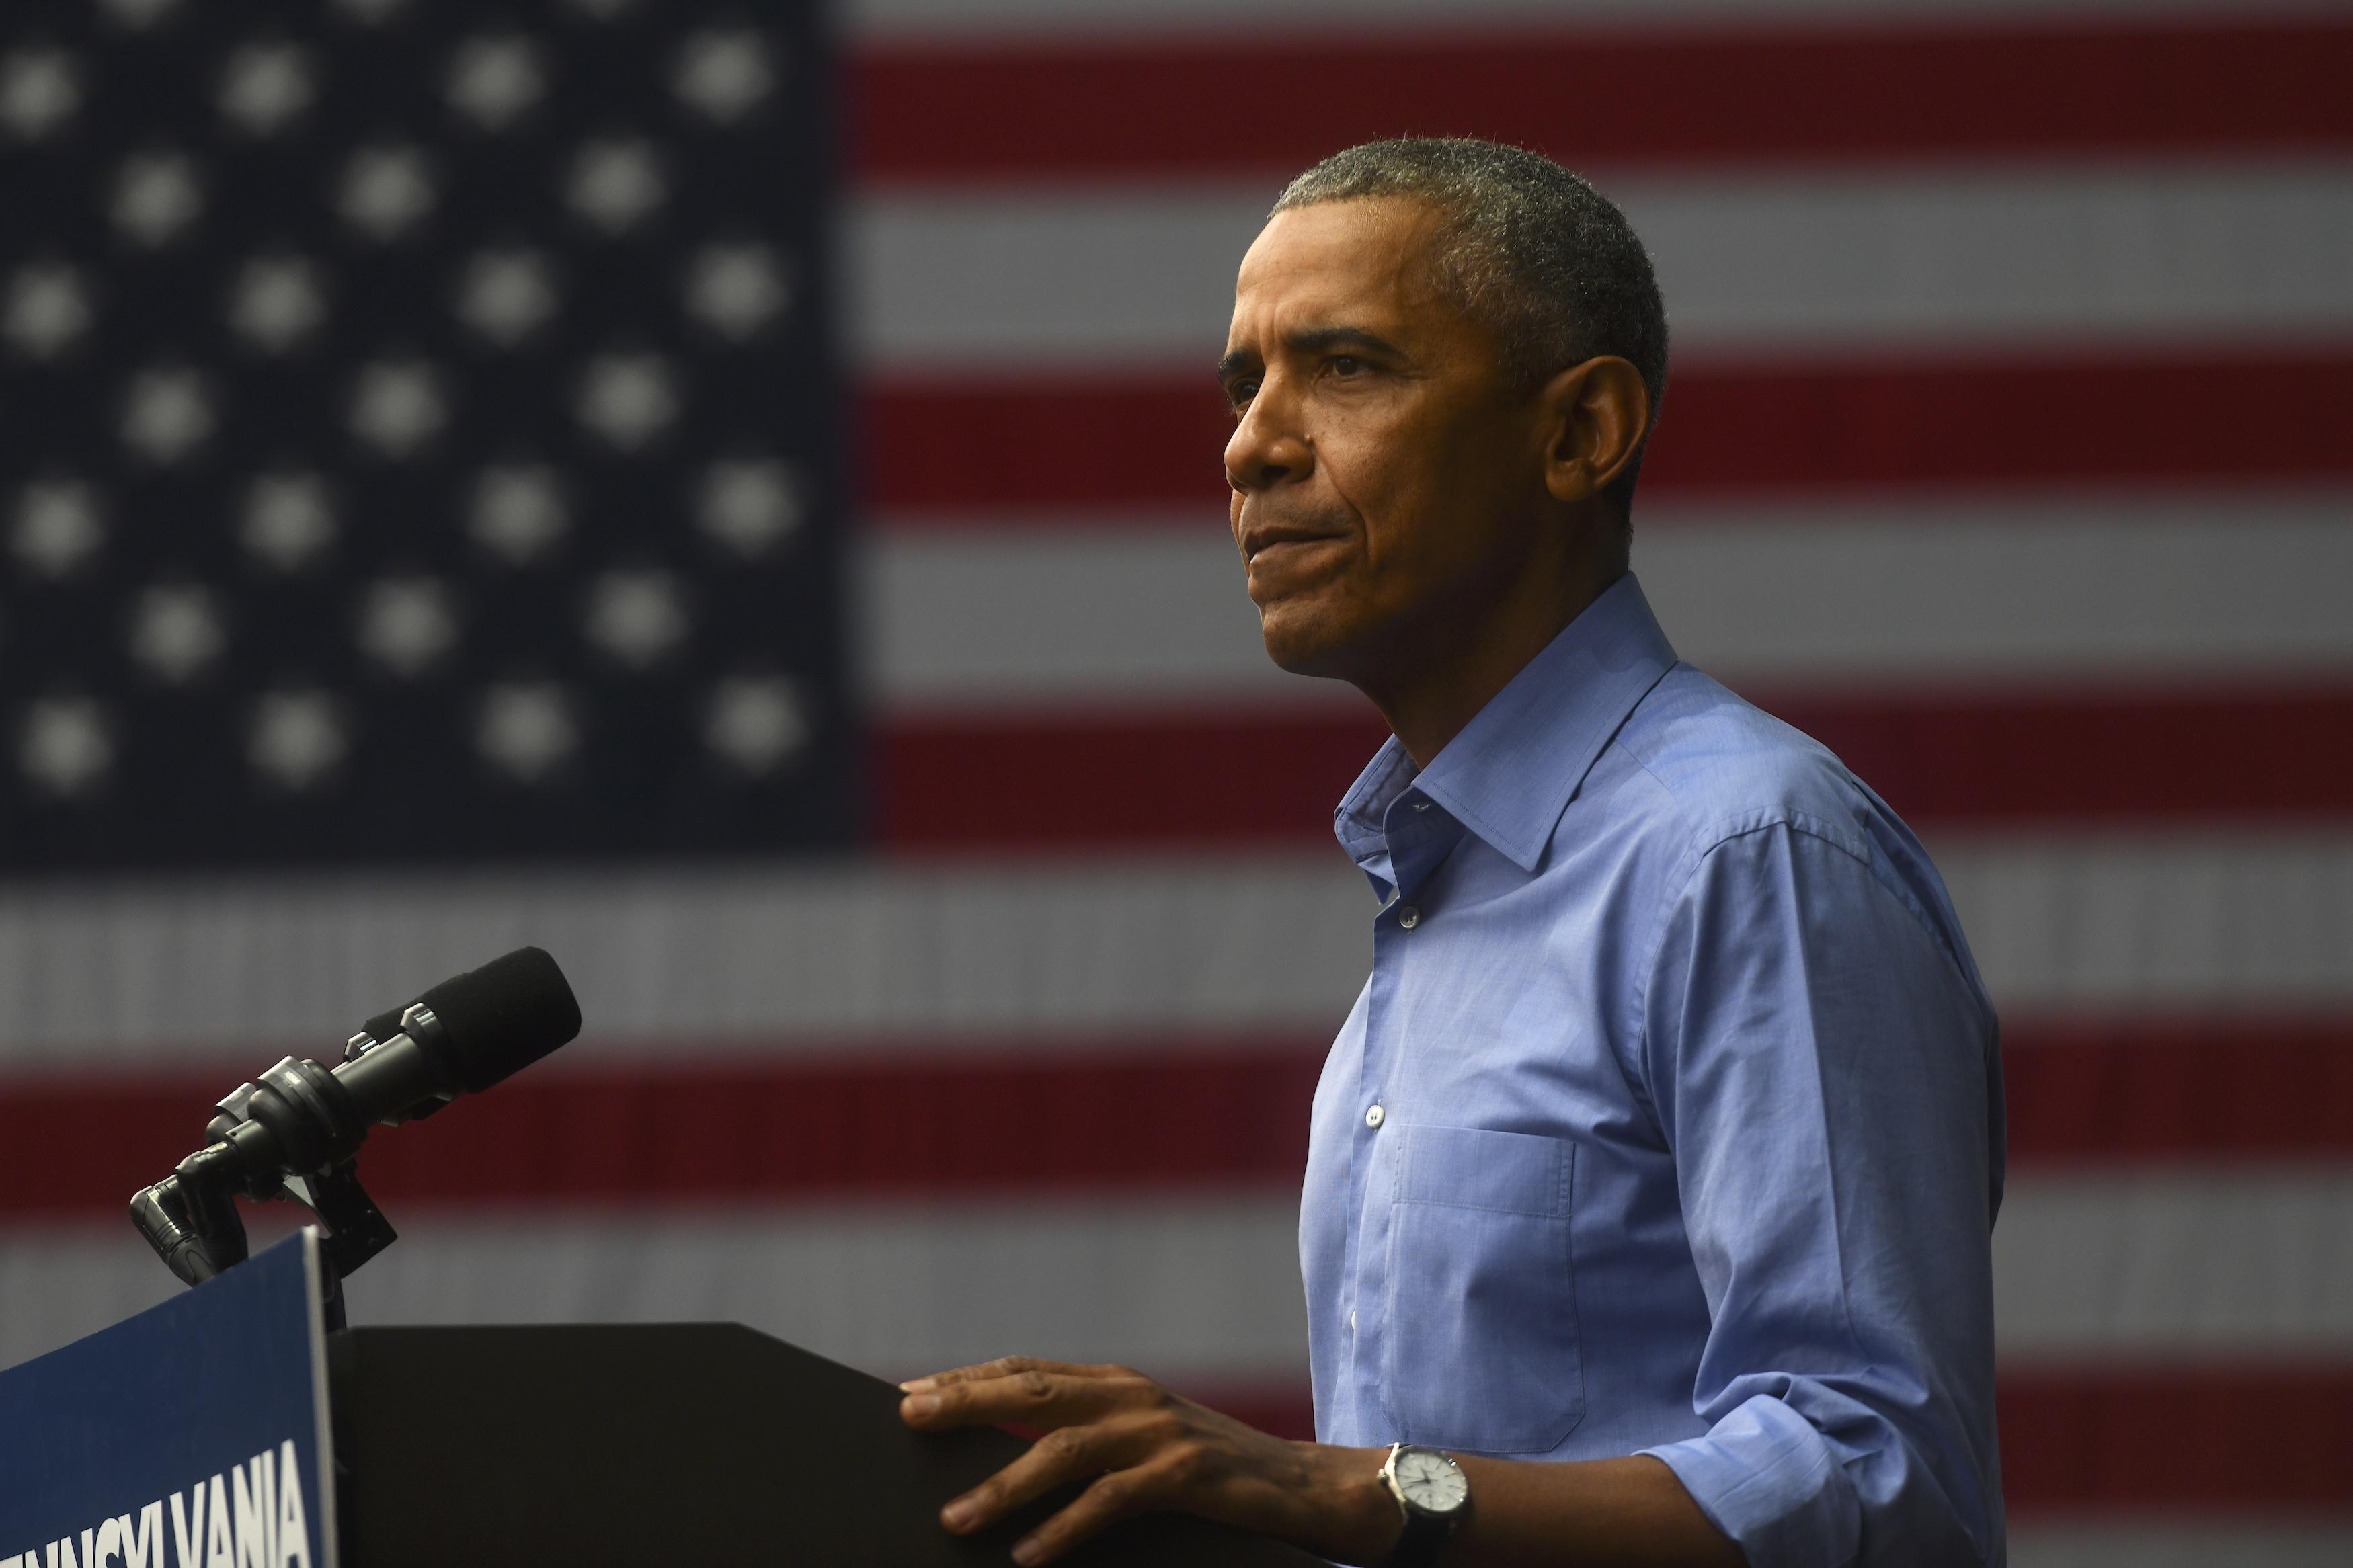 Obama da discurso durante mitin en Filadelfia